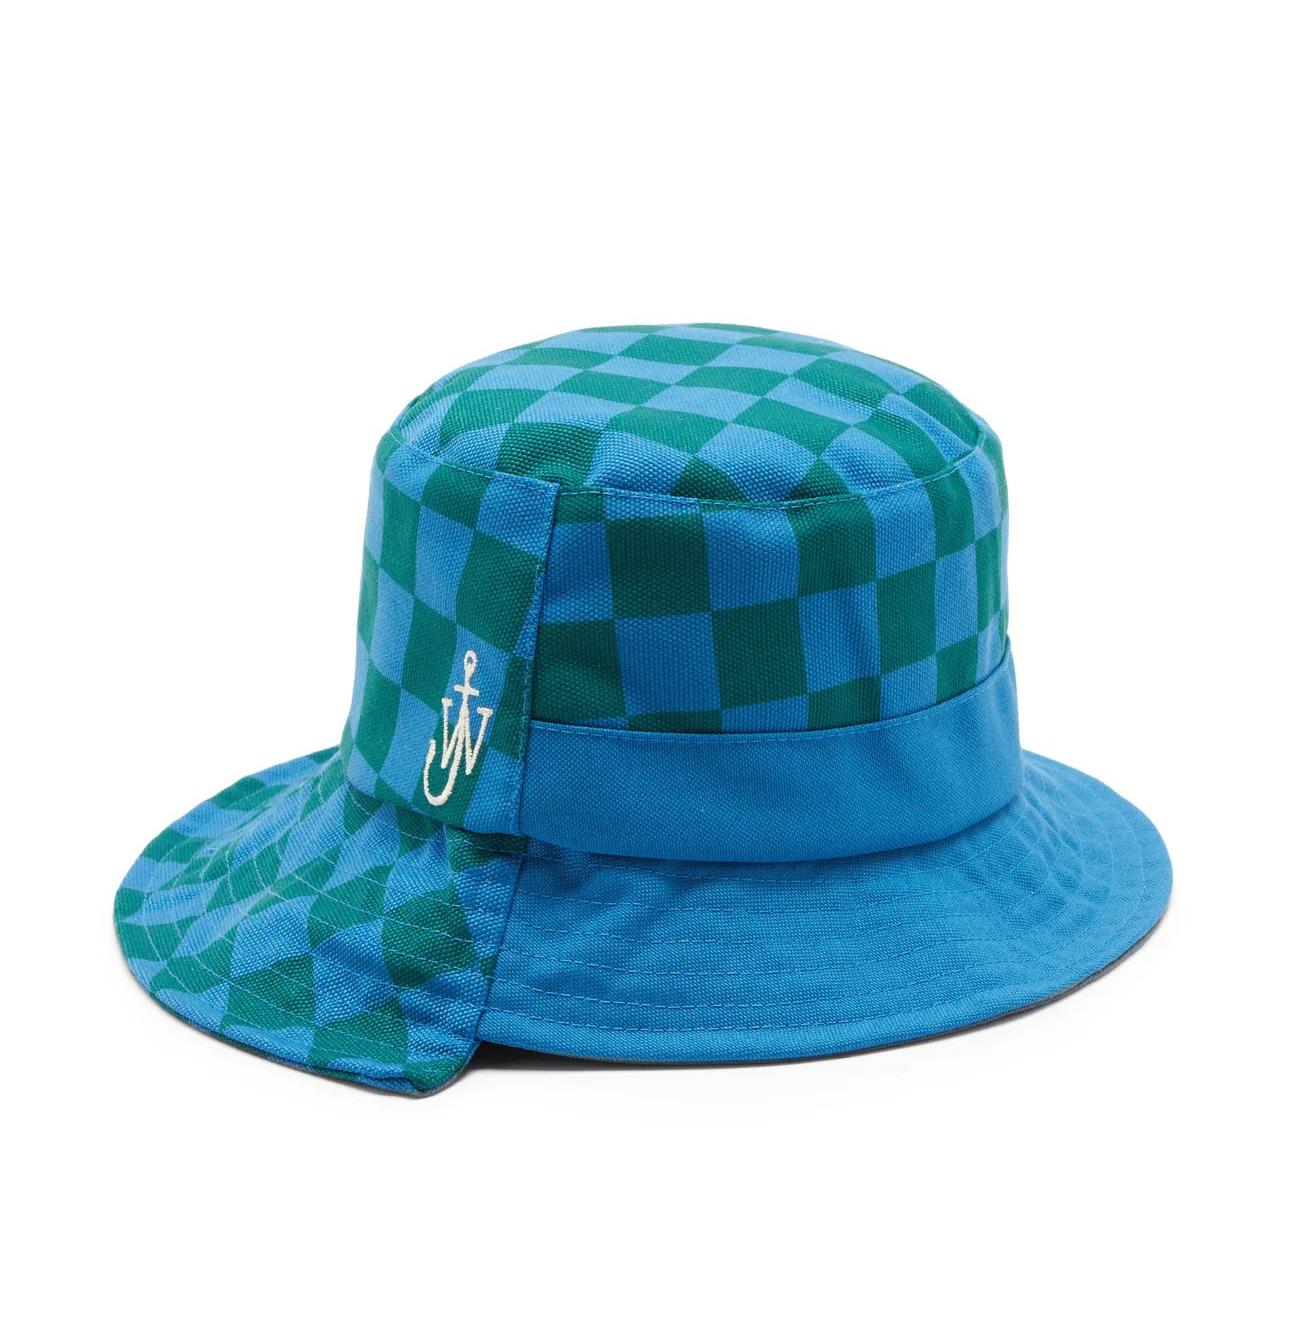 JW Anderson Asymmetric Checked Bucket Hat